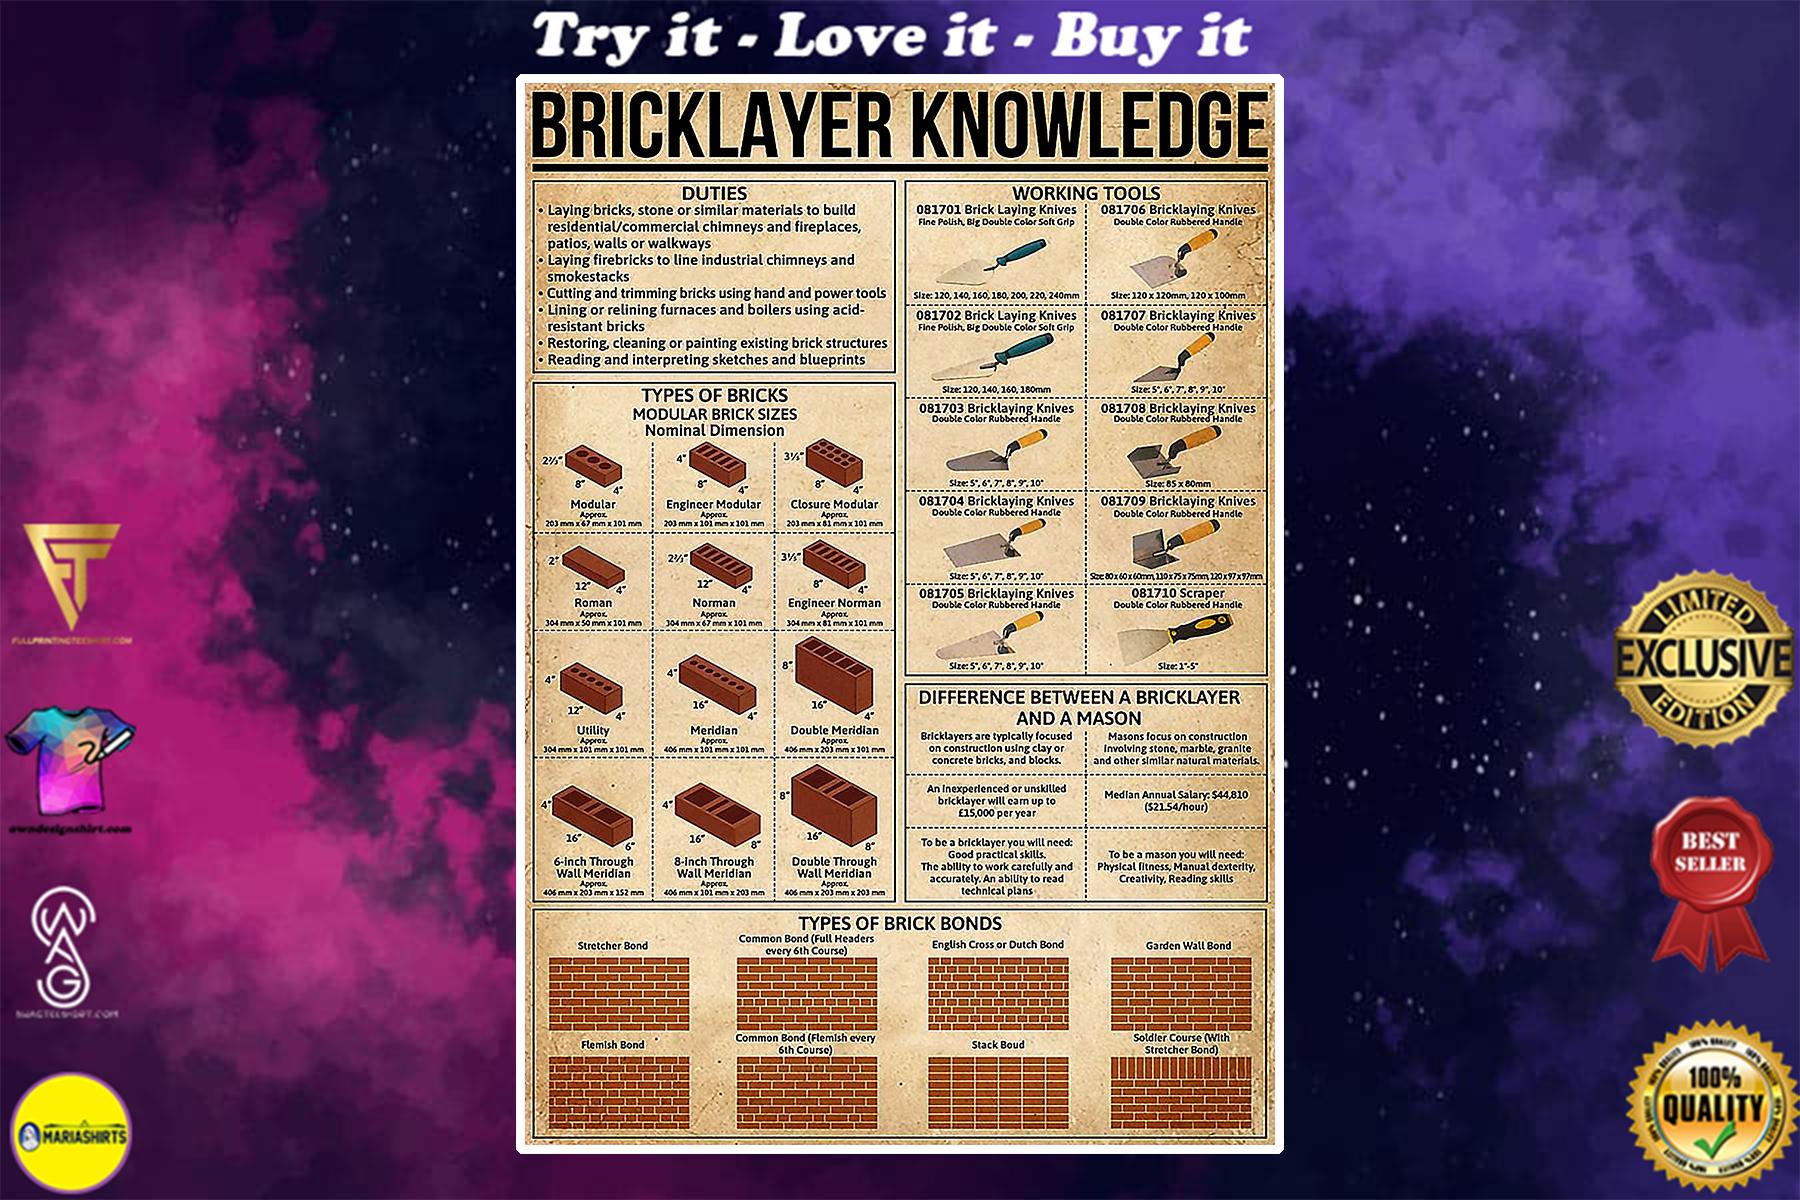 vintage bricklayer knowledge poster